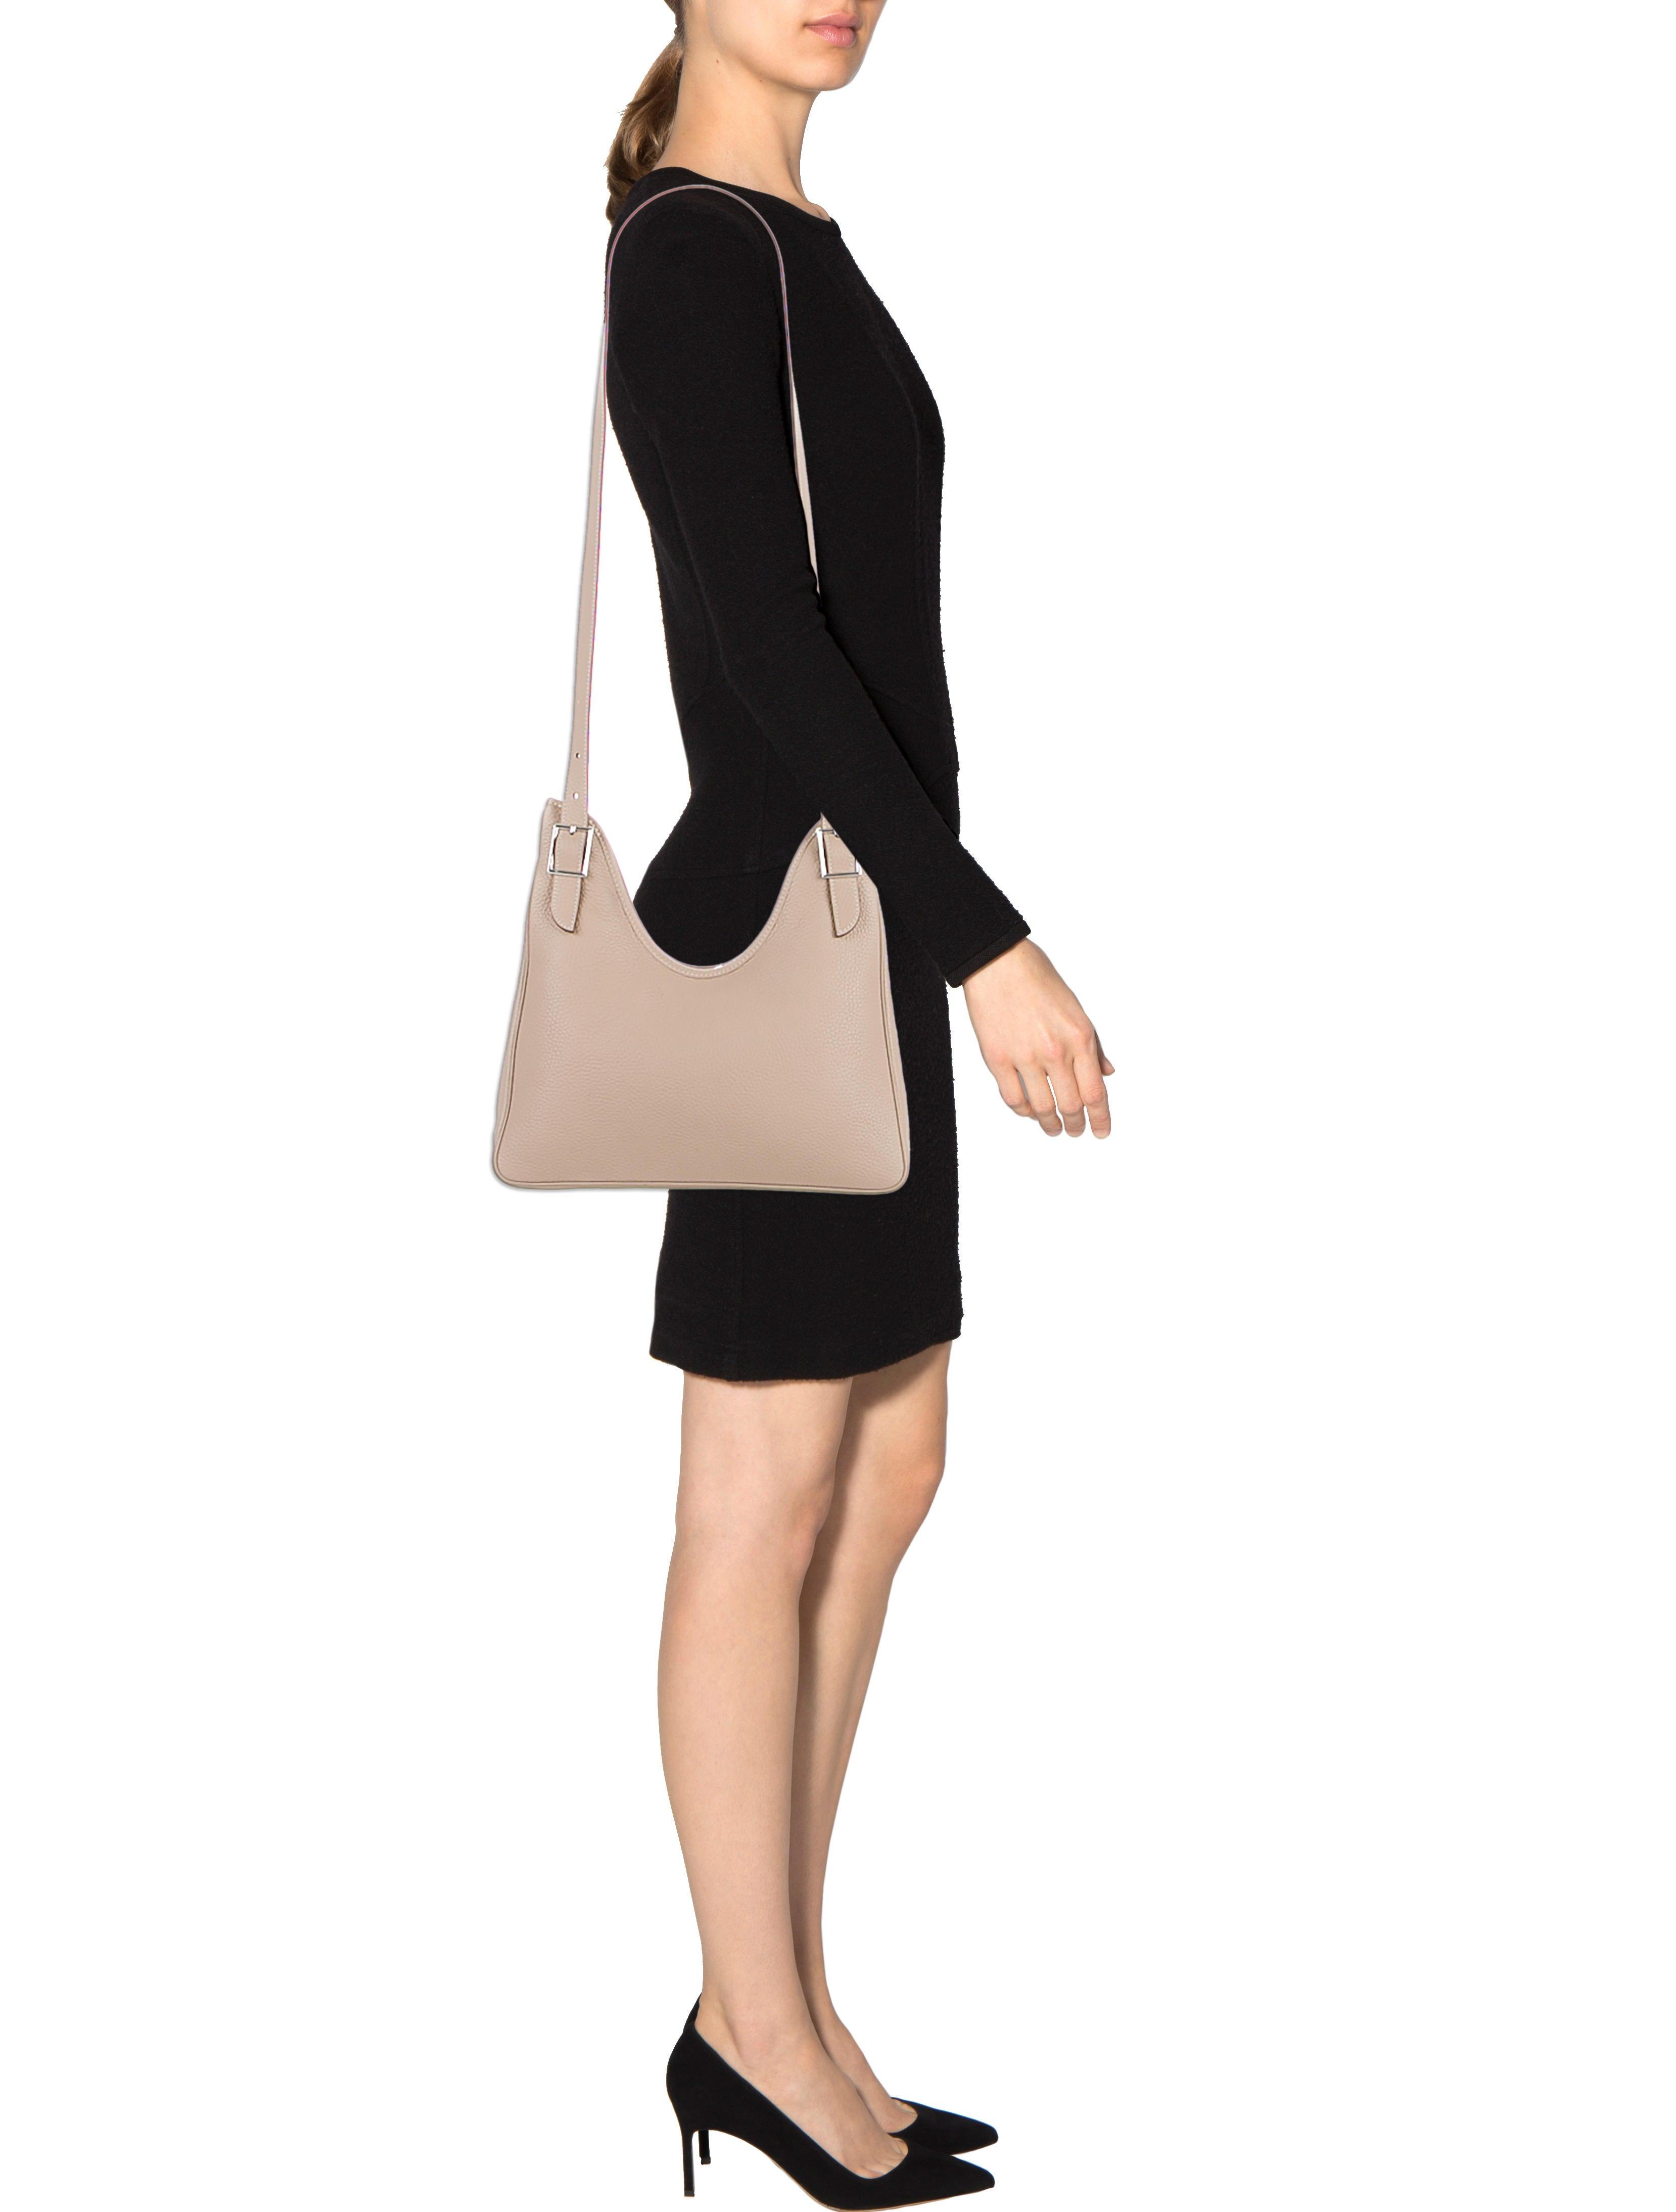 Herm��s Clemence Massai Cut 32 - Handbags - HER53516 | The RealReal